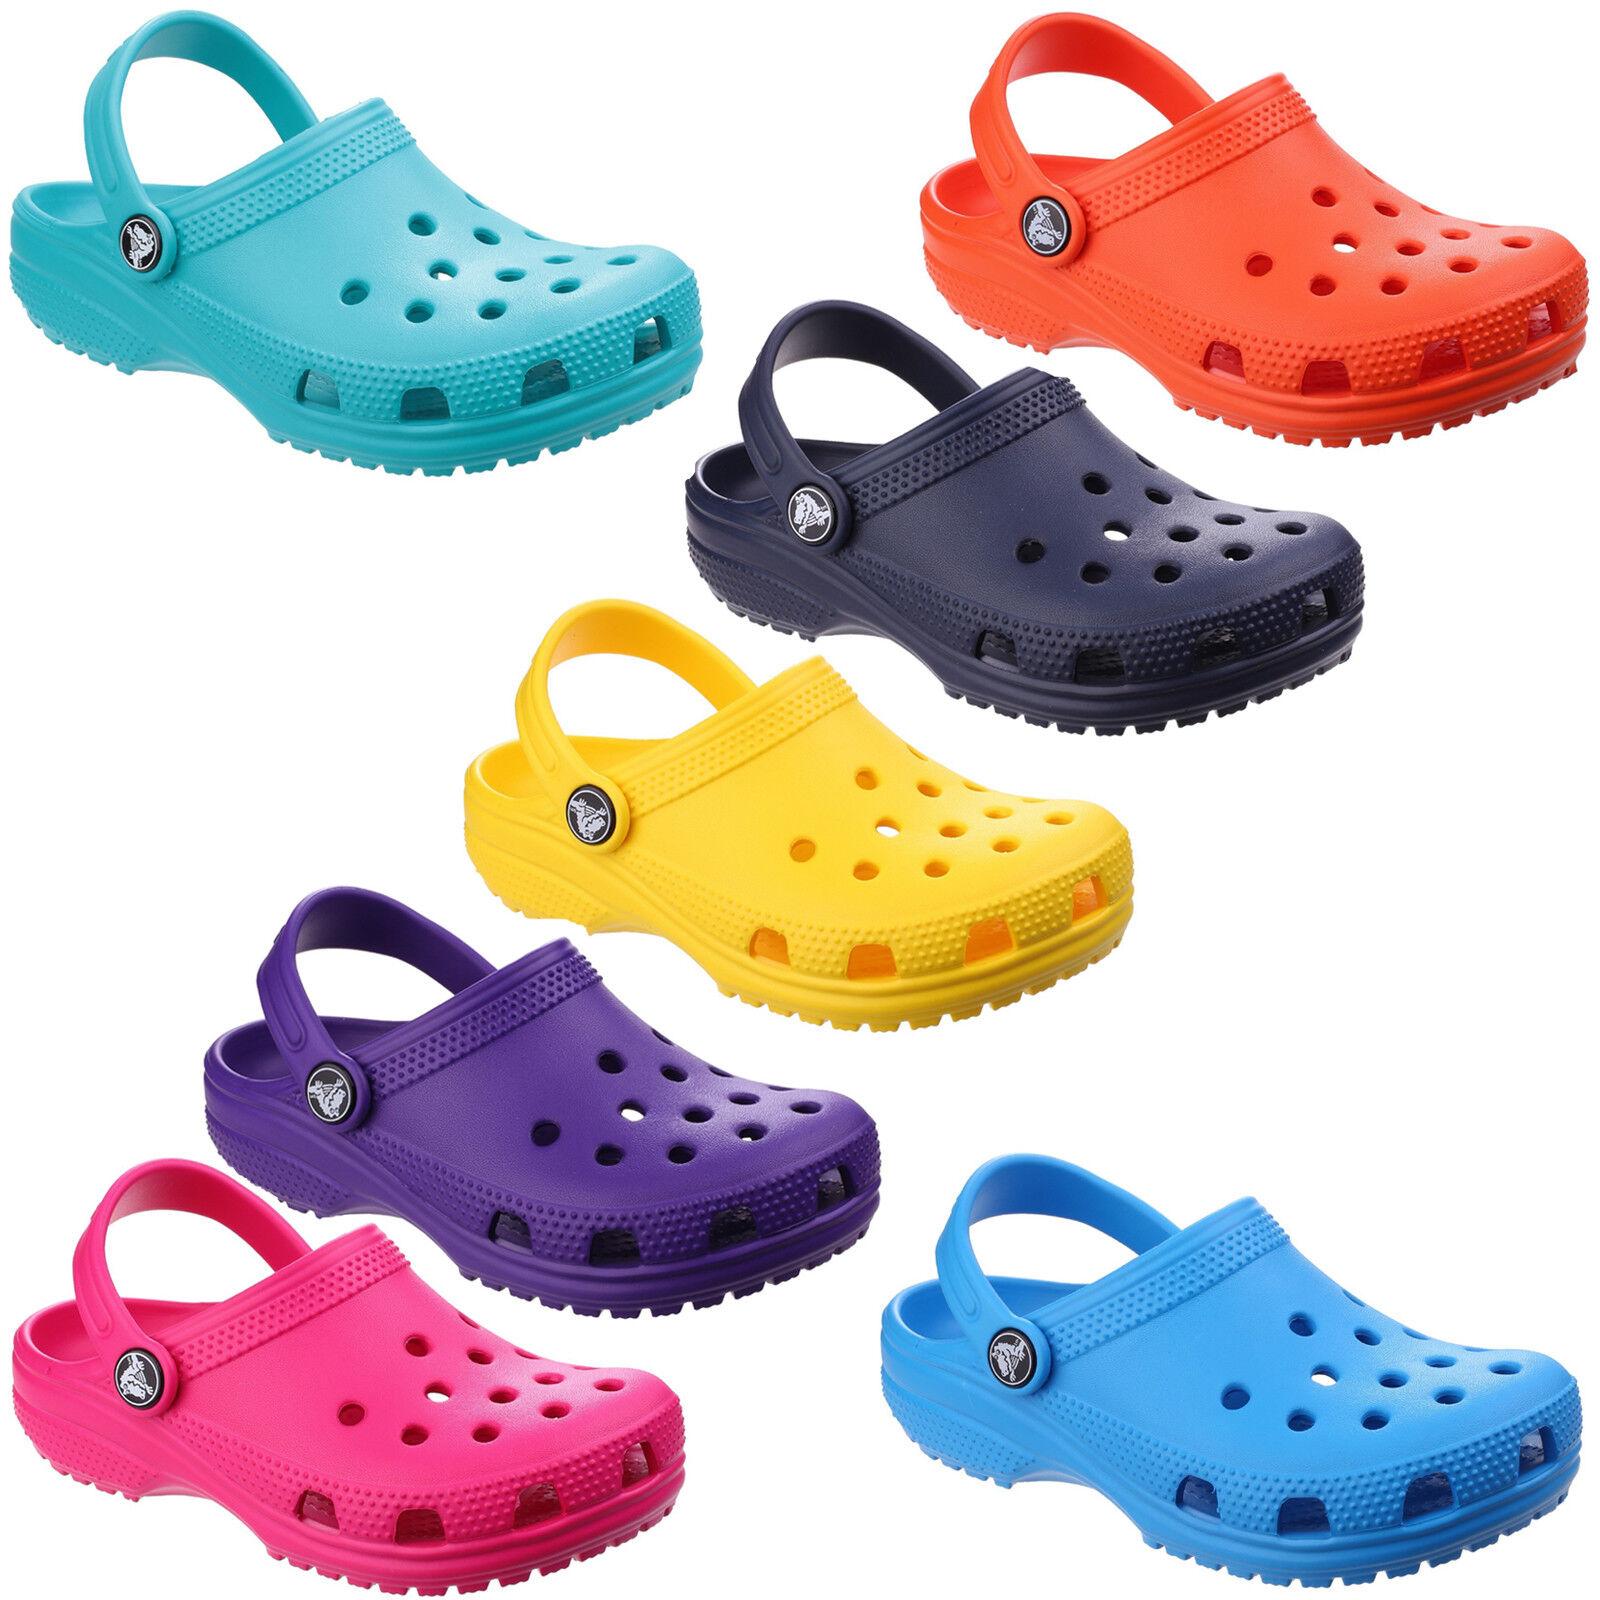 Crocs Girls Classic Kids Croslite Slingback Beach Clog Yellow